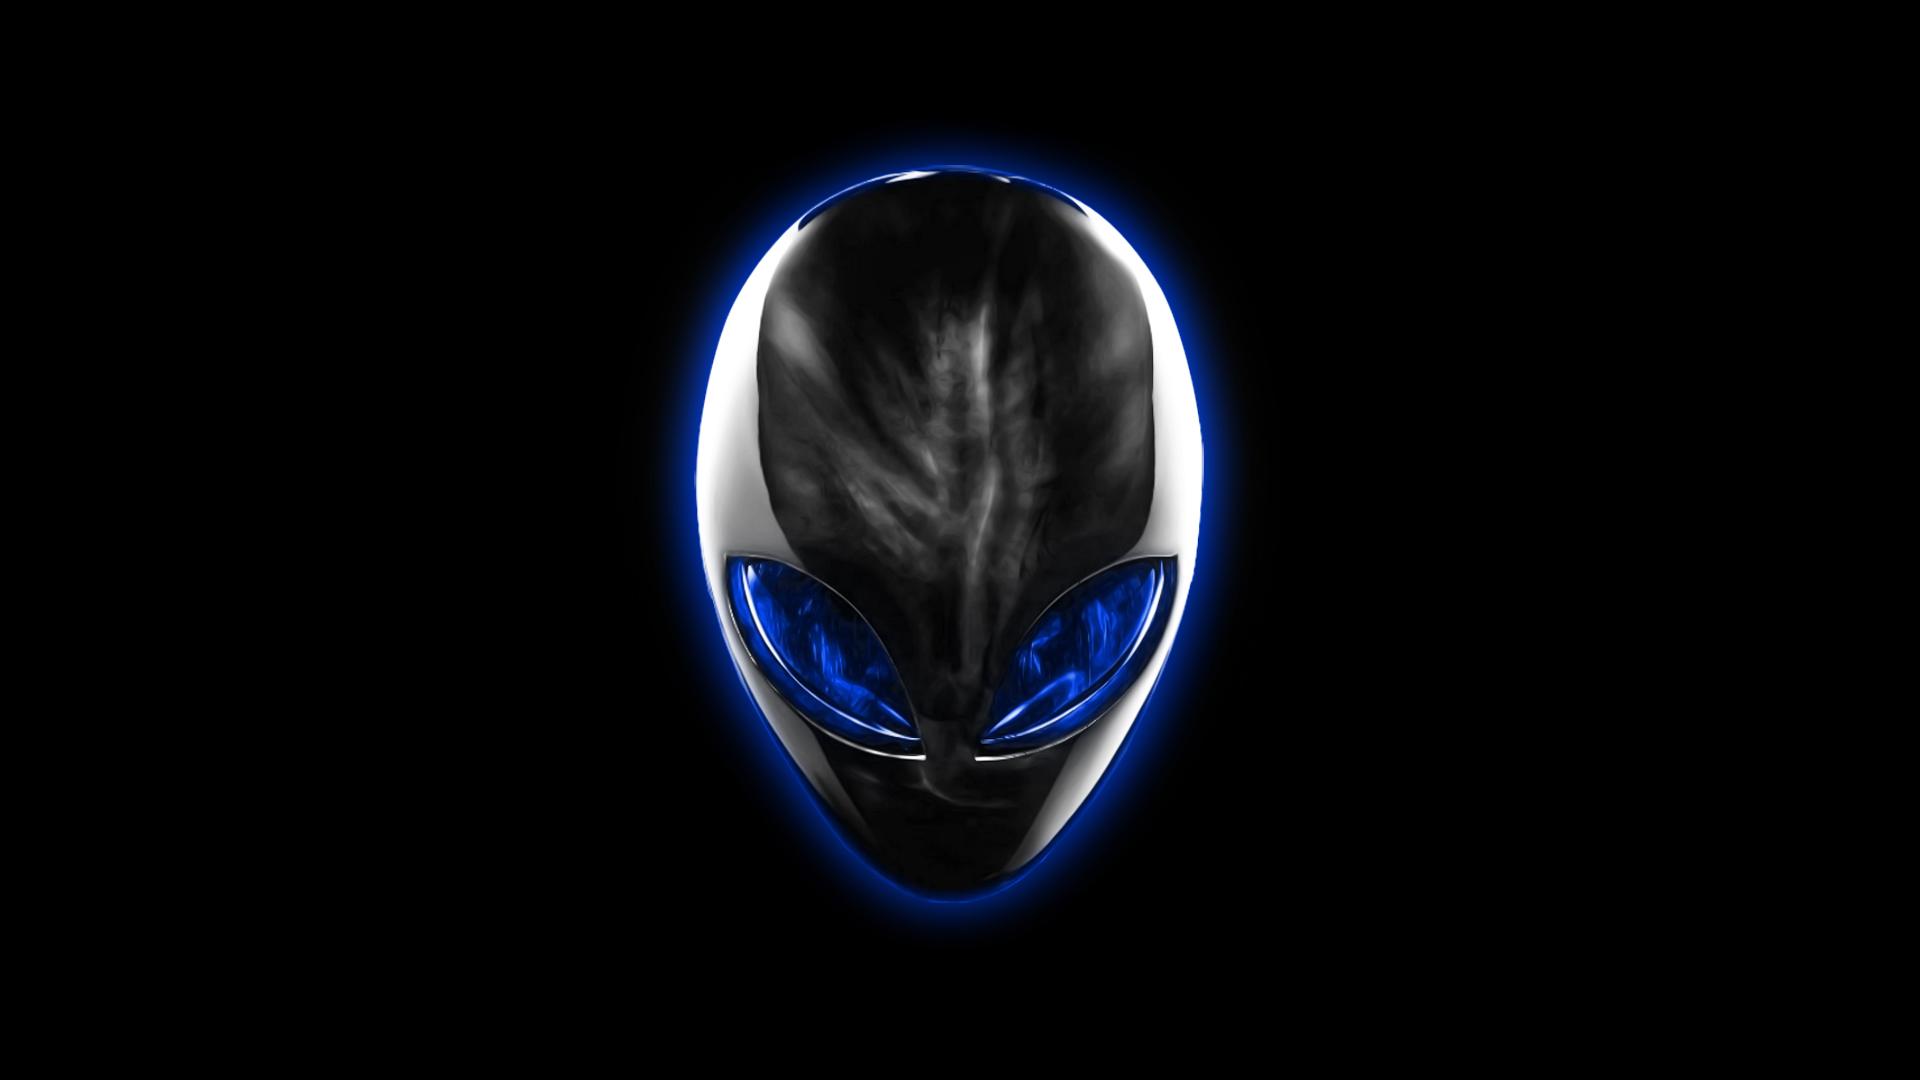 alienware logo blue eyes black backrground hd 1920x1080 1080p 1920x1080